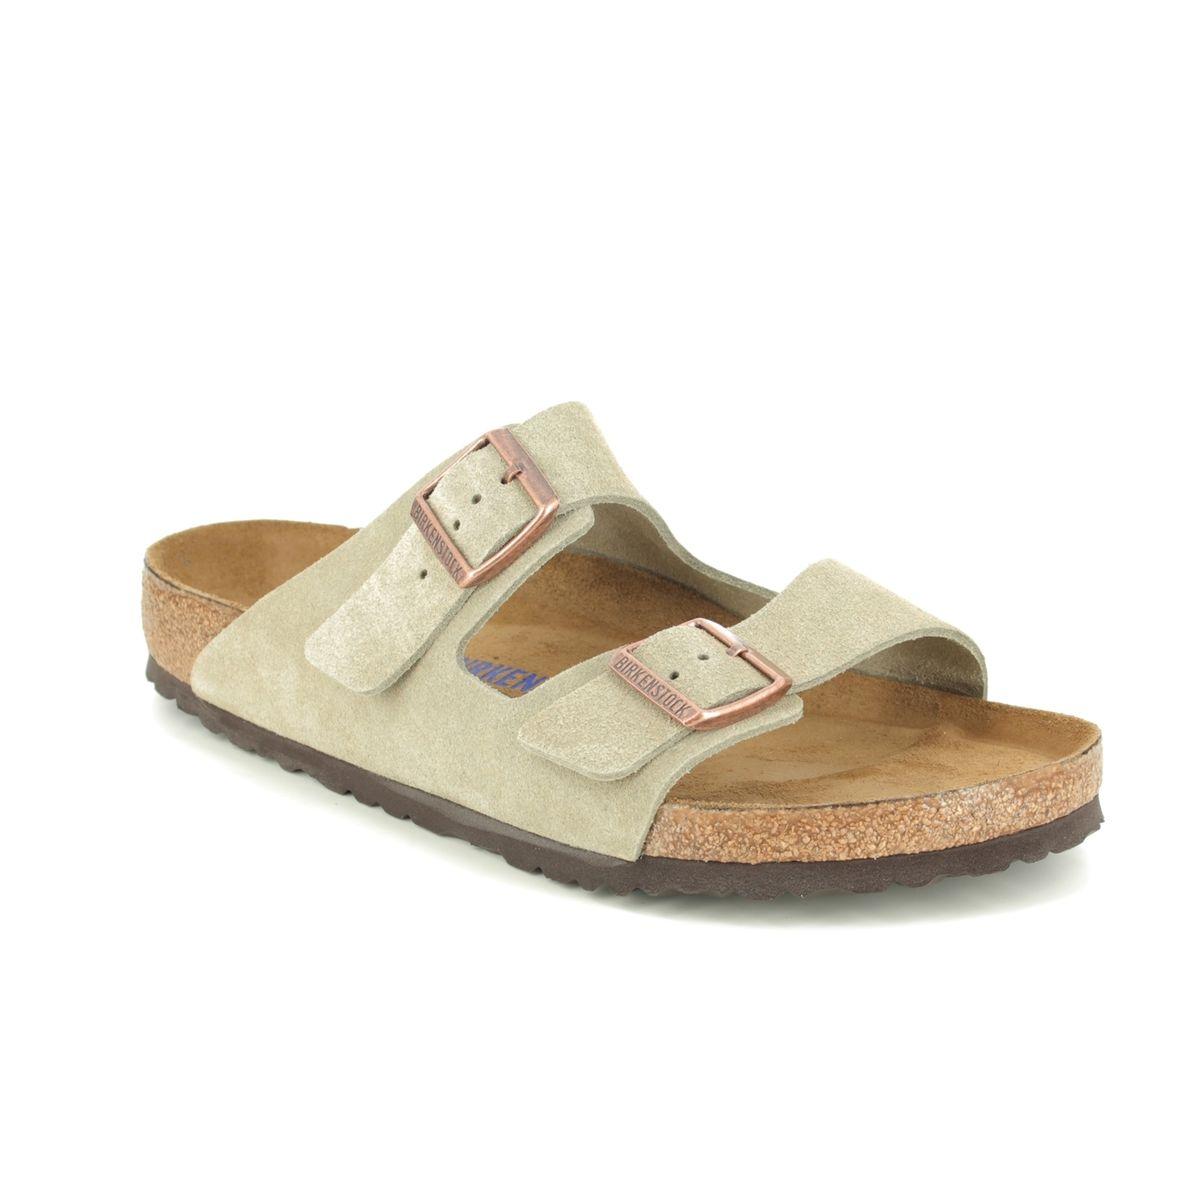 Comida líquido orden  Birkenstock Arizona Mens 0951301 Taupe suede sandals